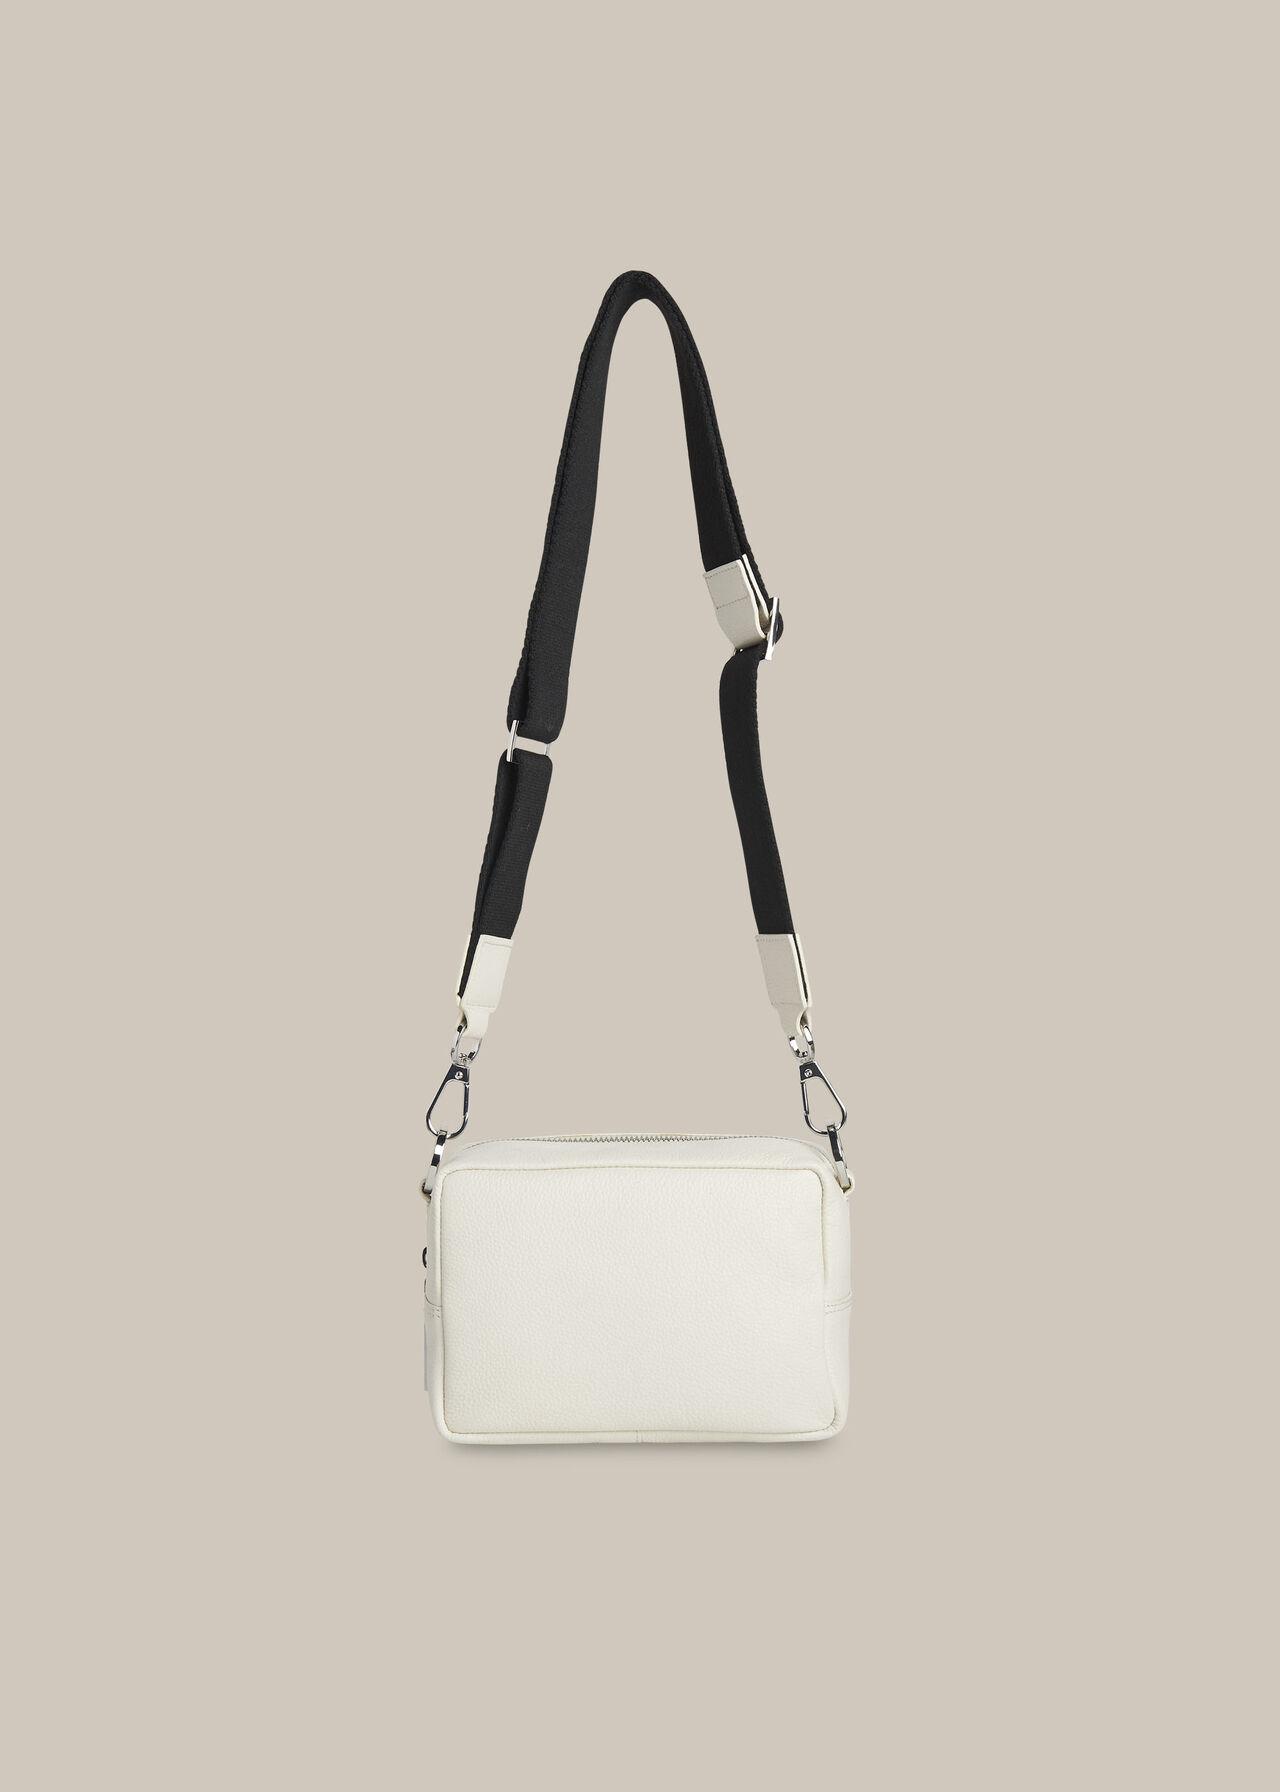 Bibi Crossbody Bag White